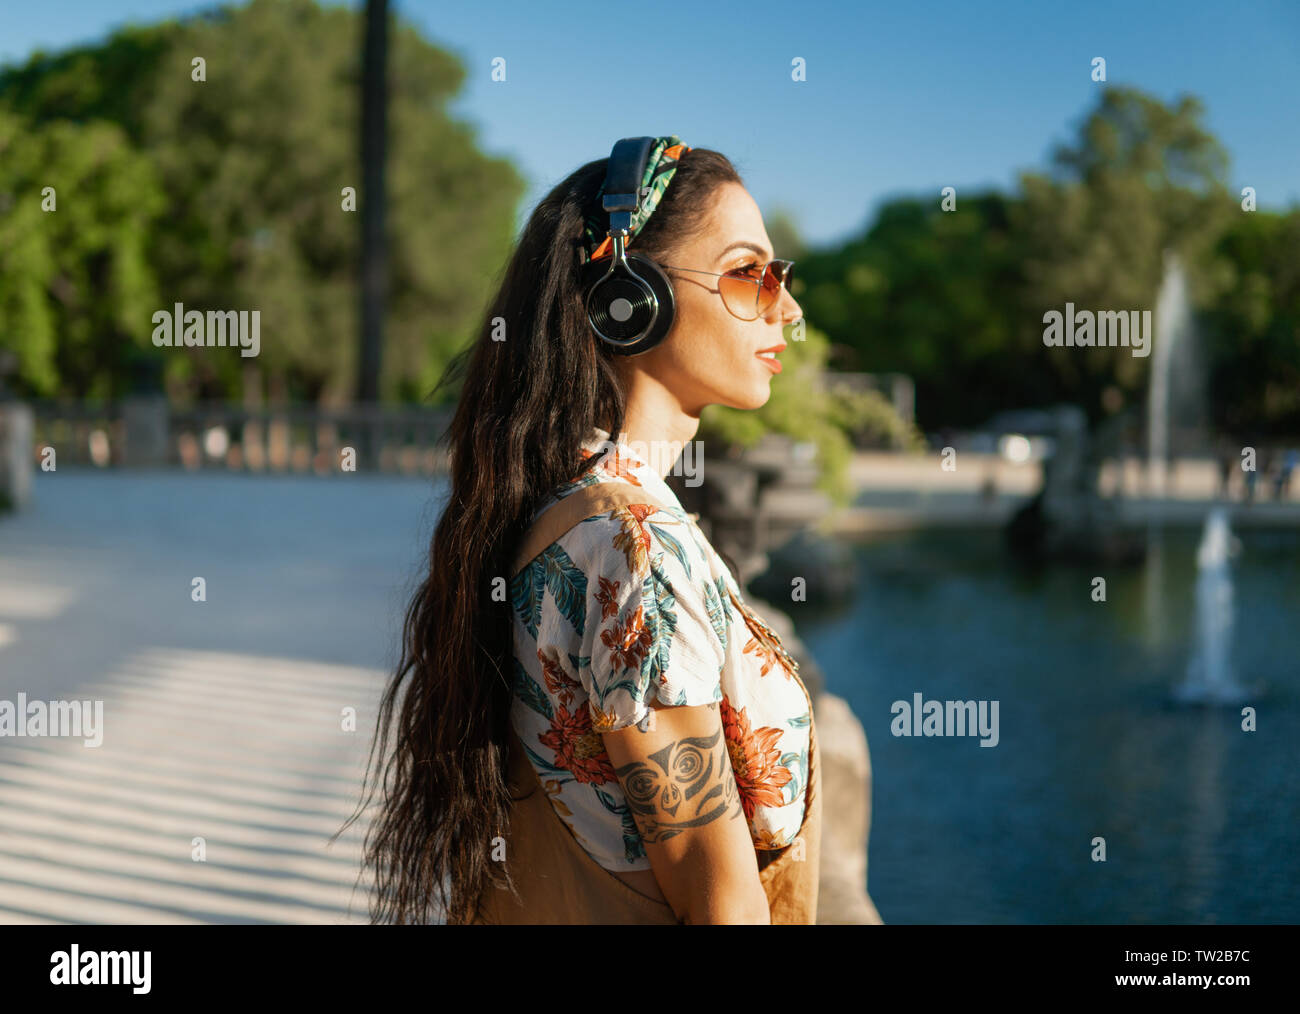 transgender model wearing sunglasses in the green park Stock Photo